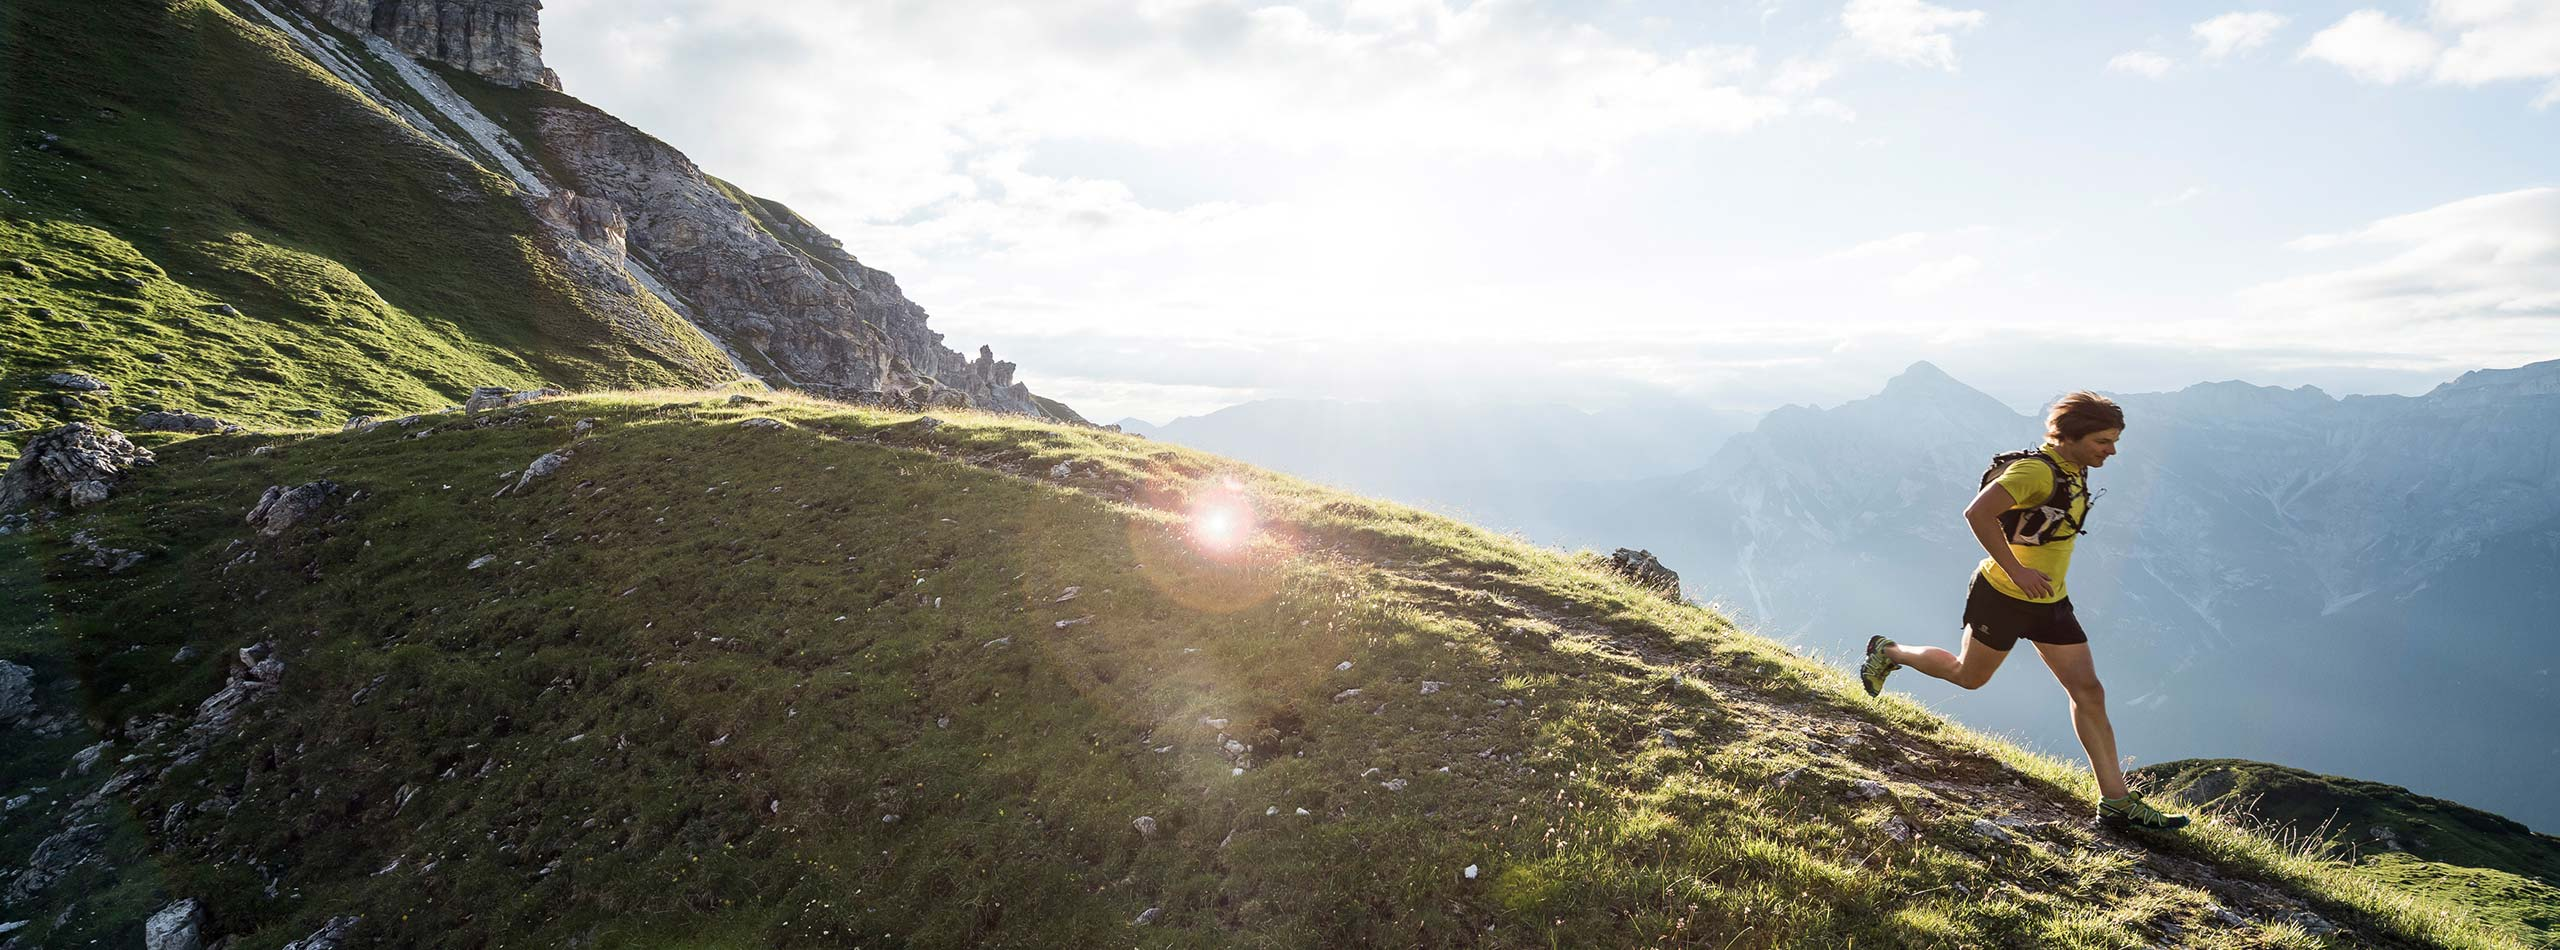 Actionurlaub im Sommer im 4-Sterne-Hotel Happy Stubai Laufen